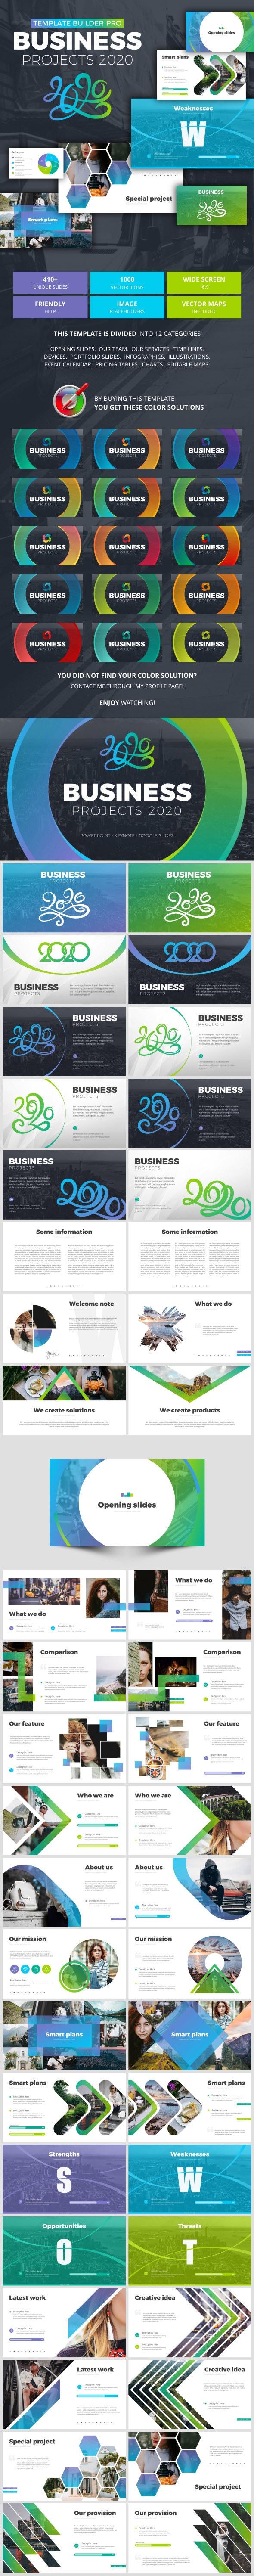 Business Projects 2020 - Google Slides Presentation Templates